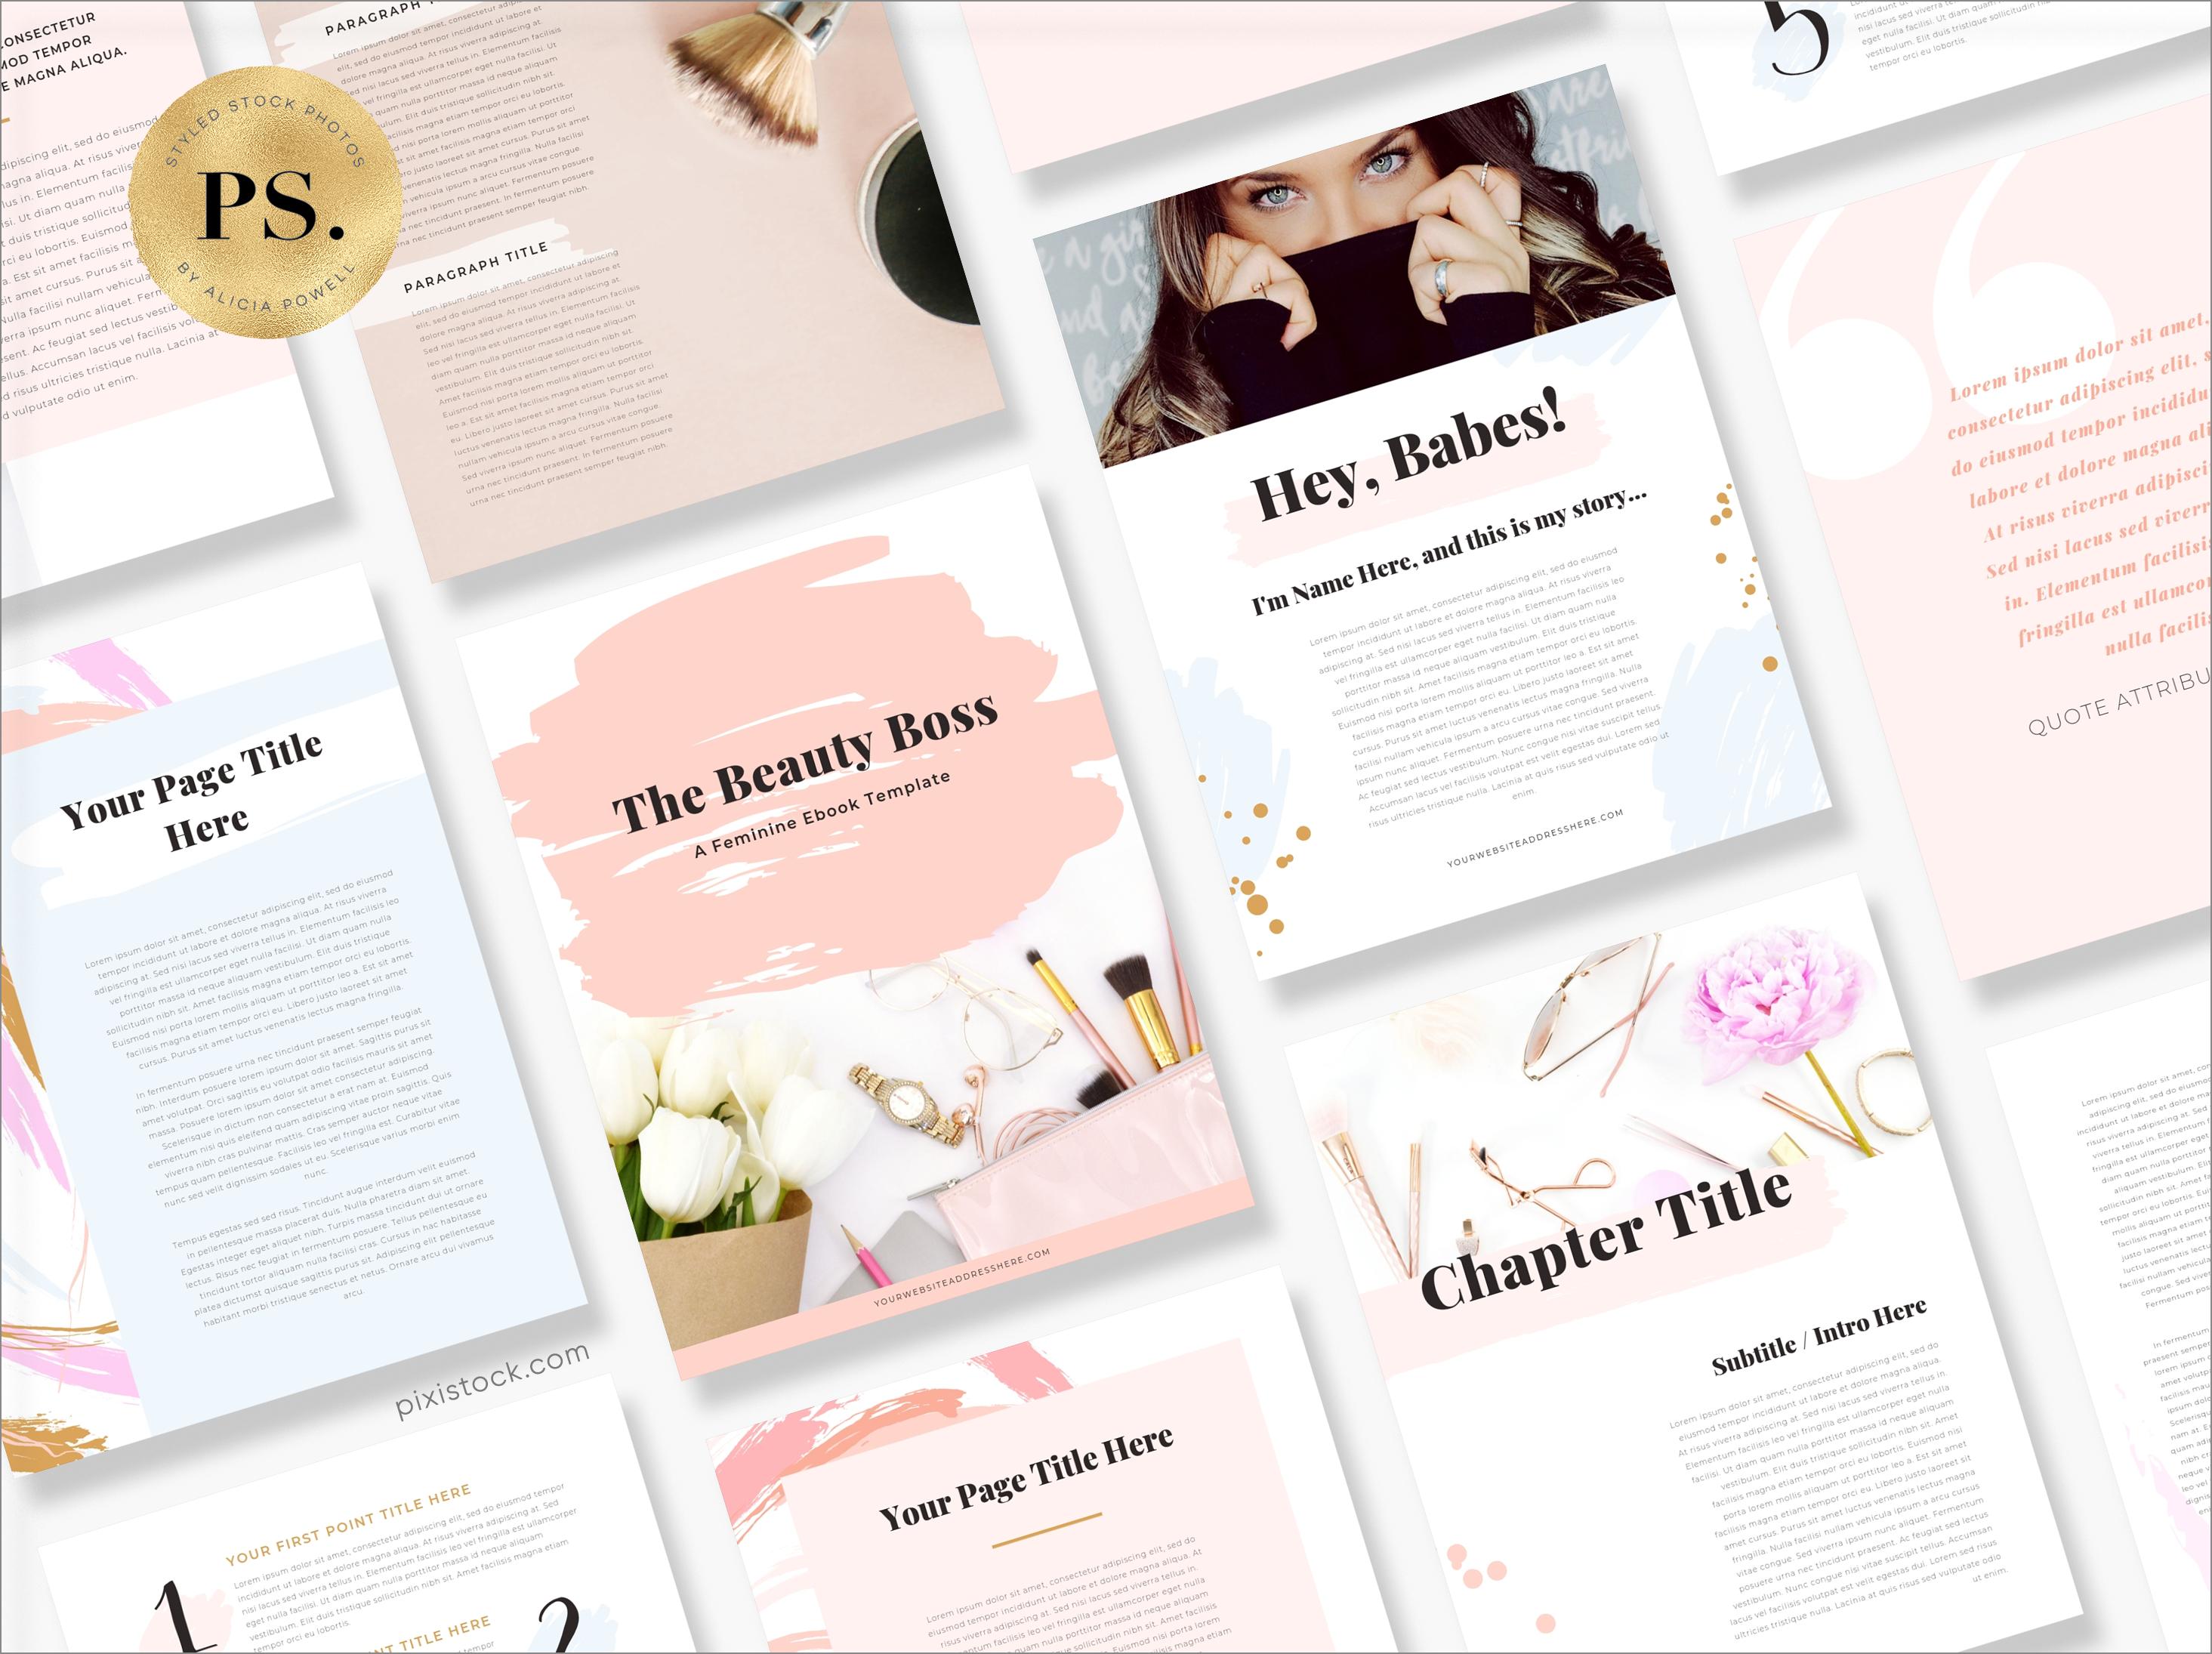 Canva Template Ebook by Pixistock - Beauty Boss